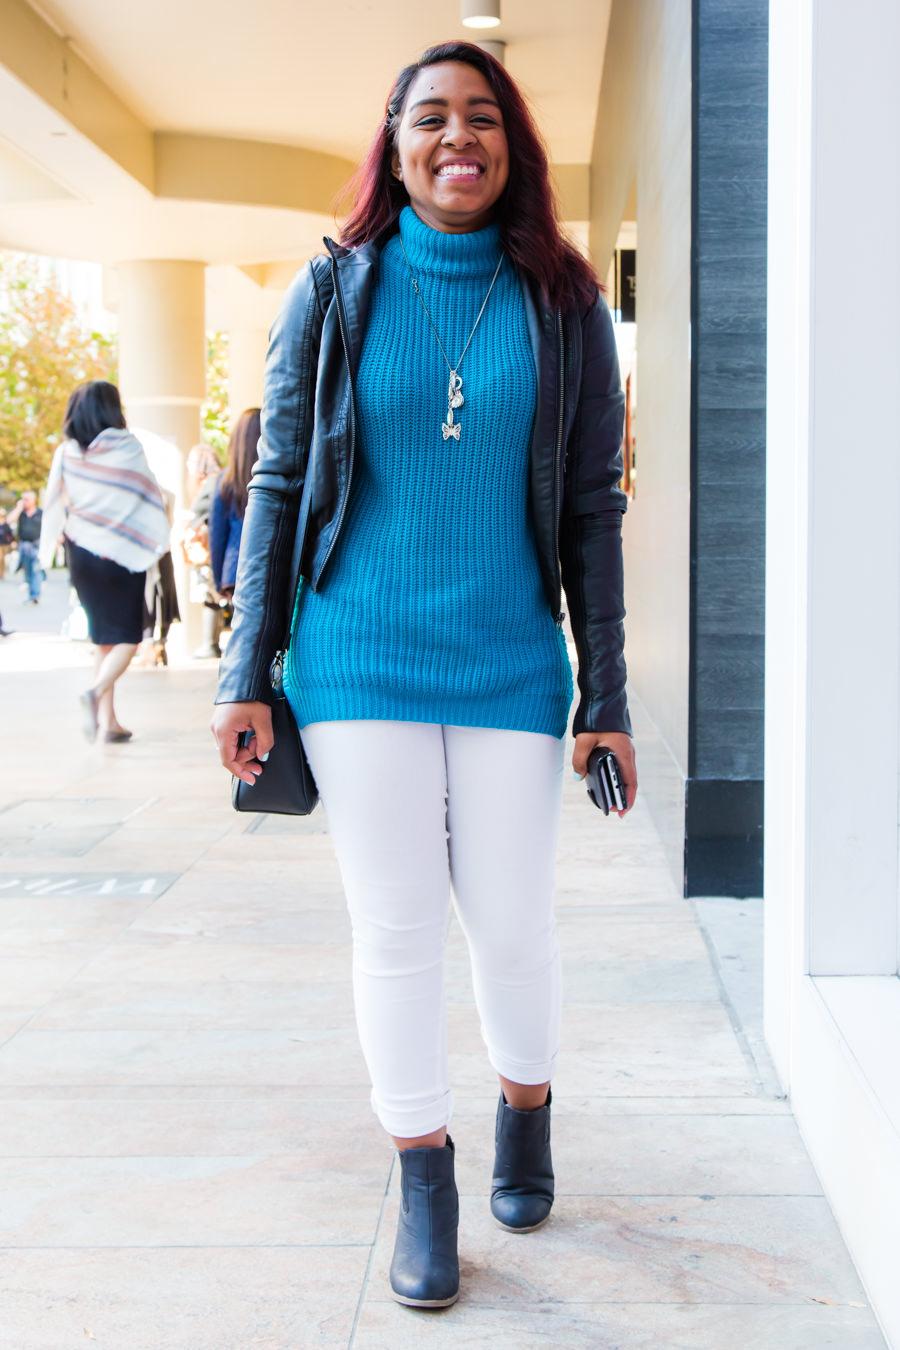 "WA: Thathianna Petit, Student, Perth City.  ""I like casual wear."" Photo: <a href=""http://www.rahstudios.com.au/street-style.html/"" target=""_blank"">Alain Quah</a>"